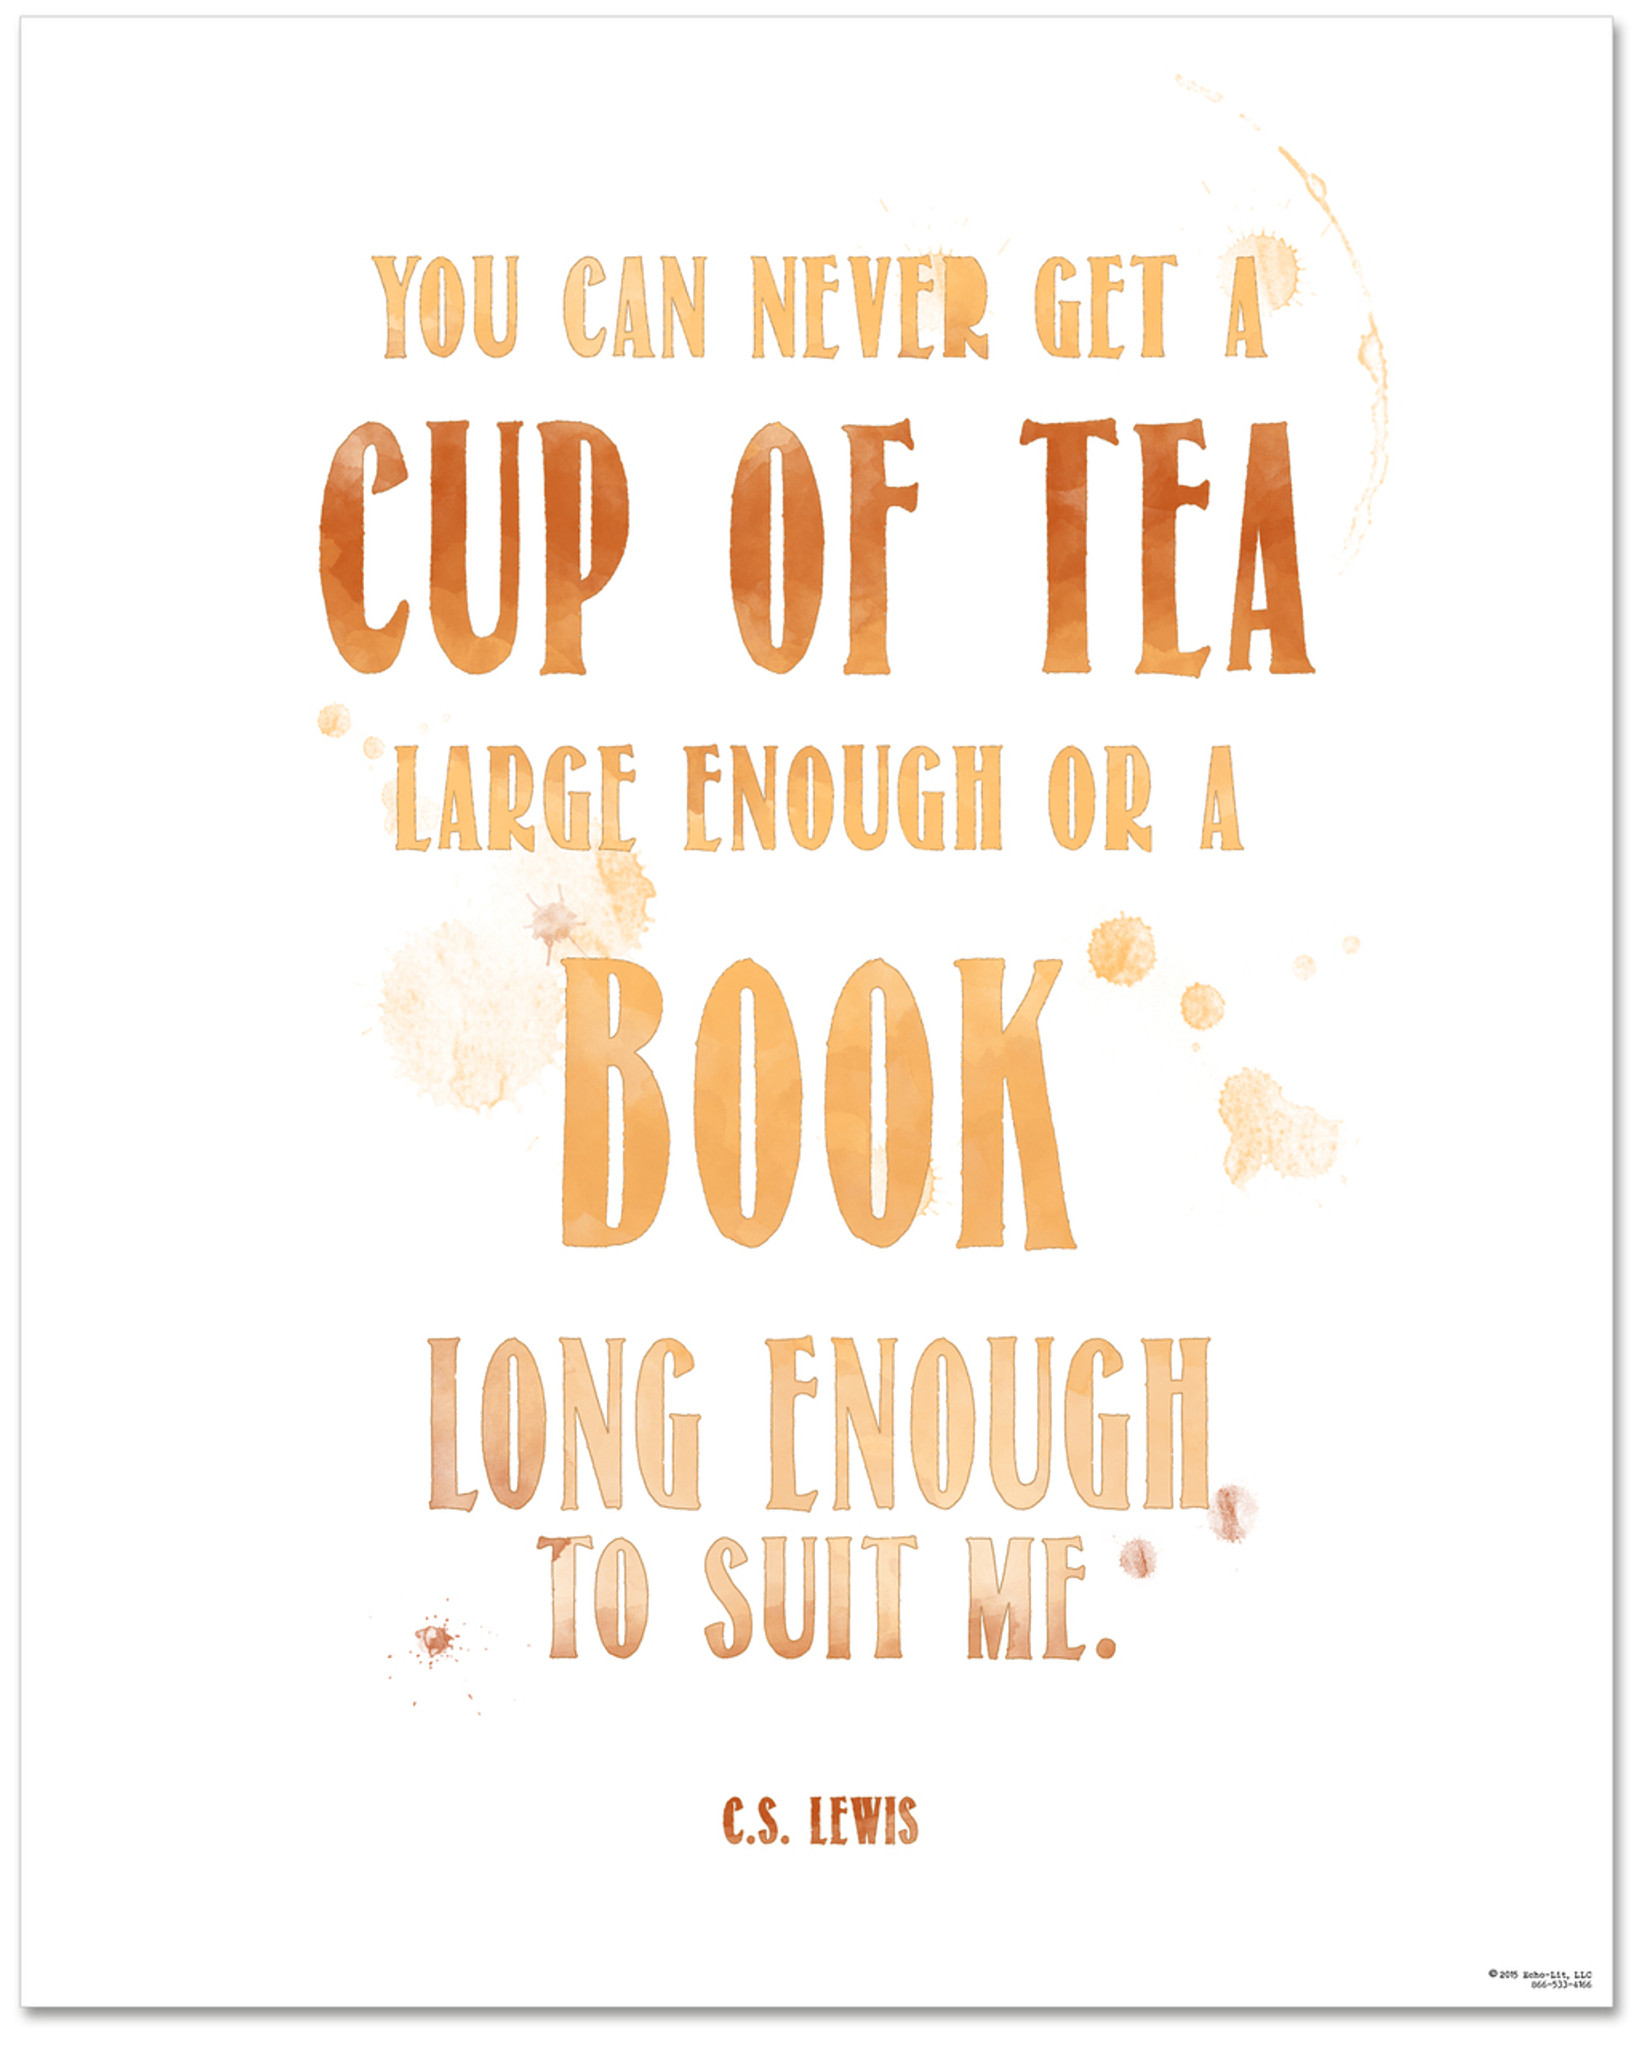 Tea Quote Poster   C.S. Lewis Cup Of Tea Large Enough Book Long Enough Art